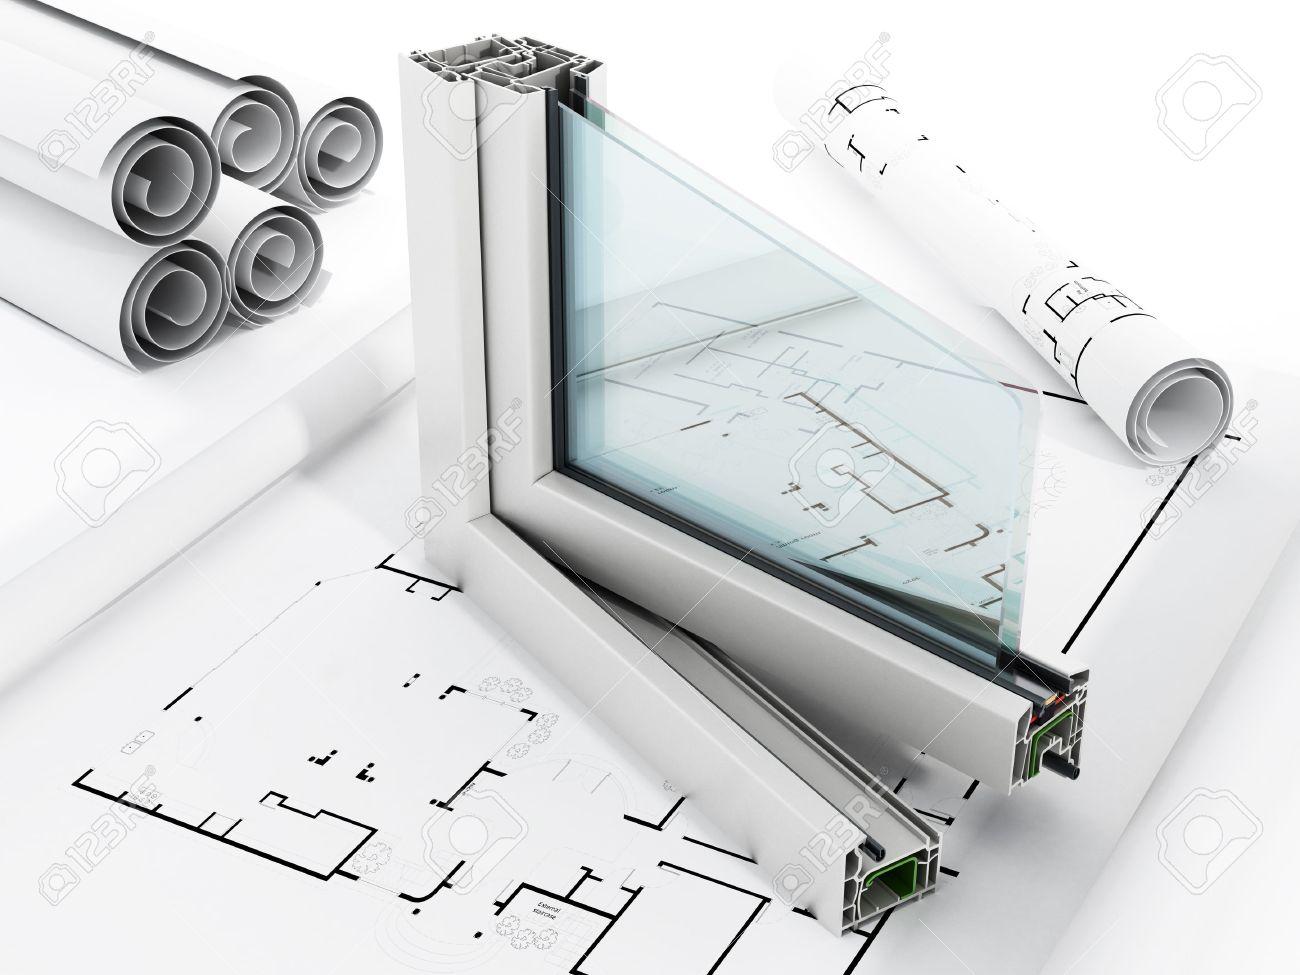 PVC window detail isolated on white background Stock Photo - 50642912